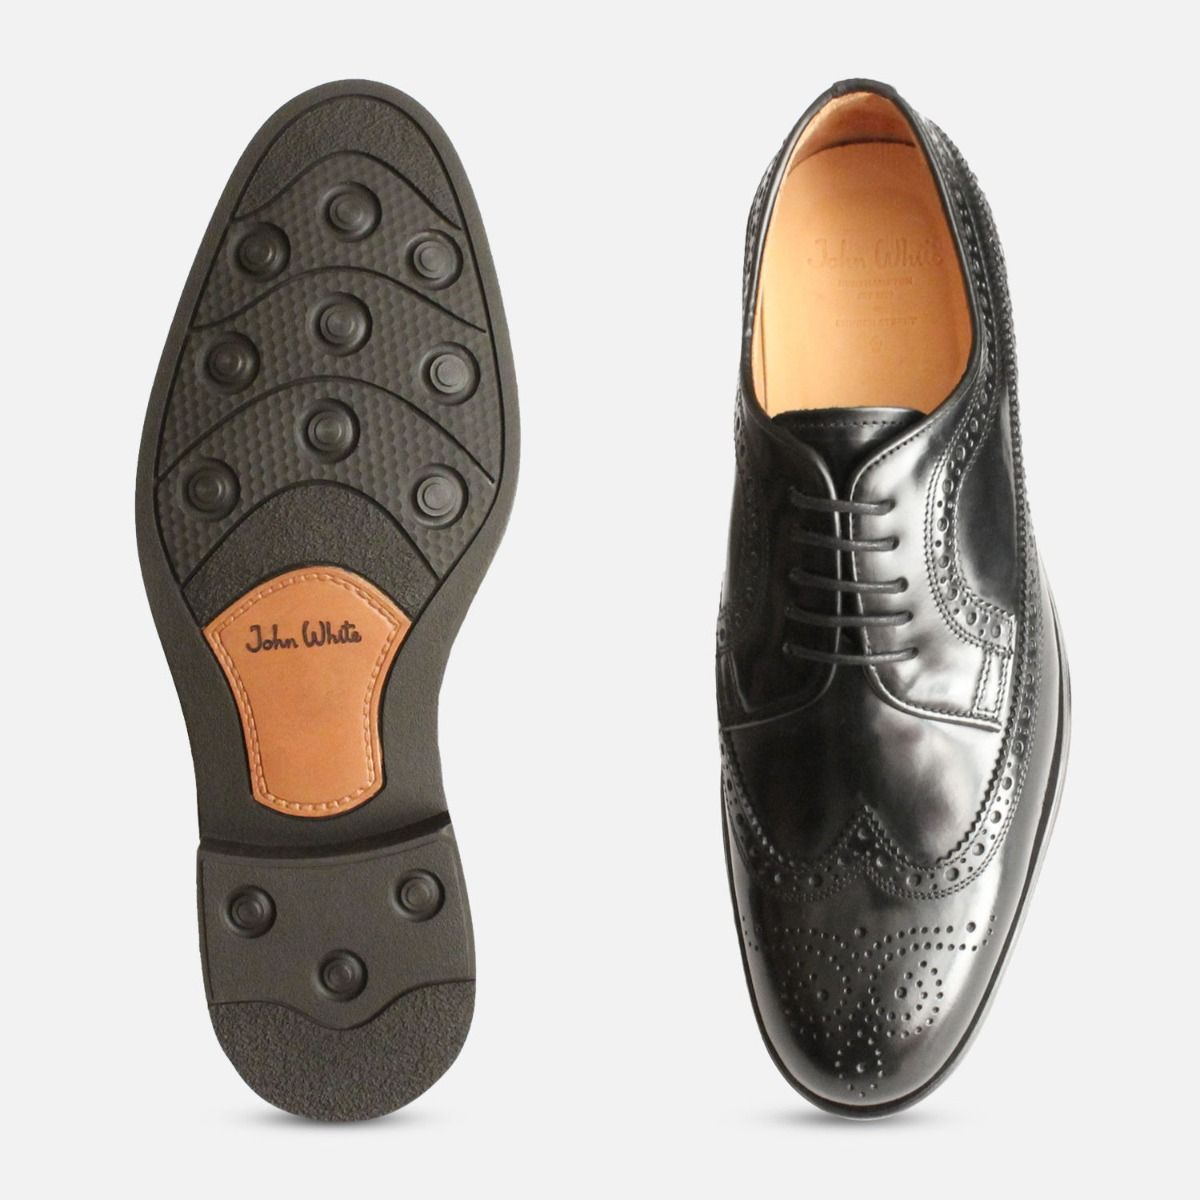 Black Longwing Bounty Brogues by John White Shoes